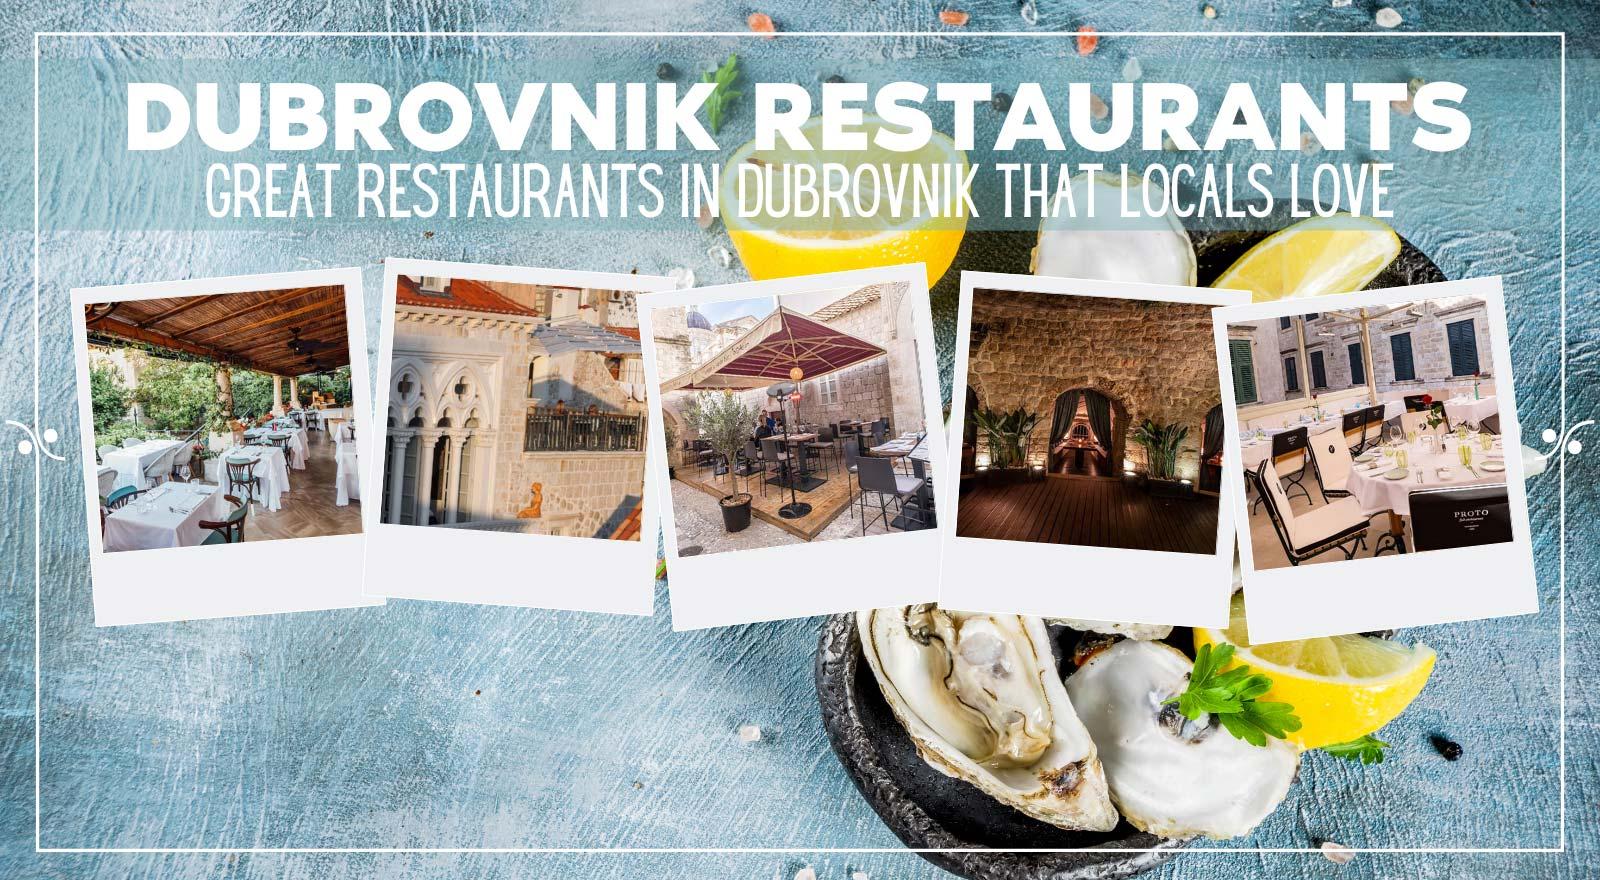 Best Restaurants In Dubrovnik Croatia: Where To Eat In Dubrovnik, Illustration